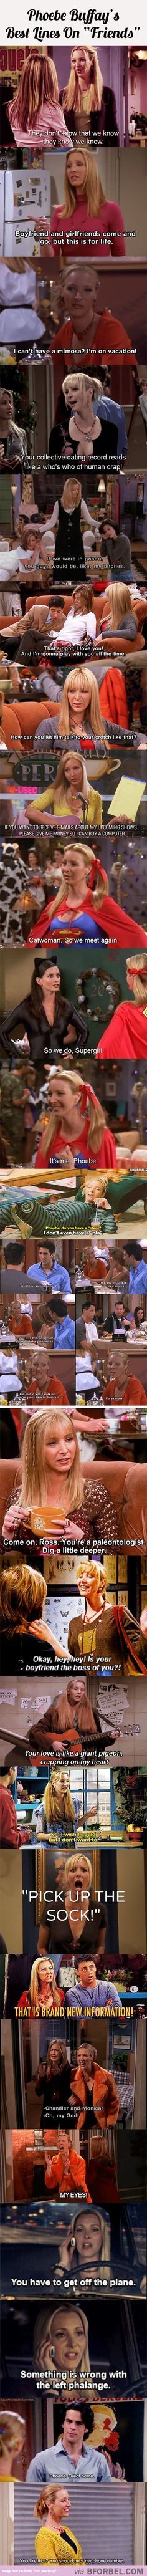 "19 Of Phoebe Buffay's Best Lines On ""Friends""…:"